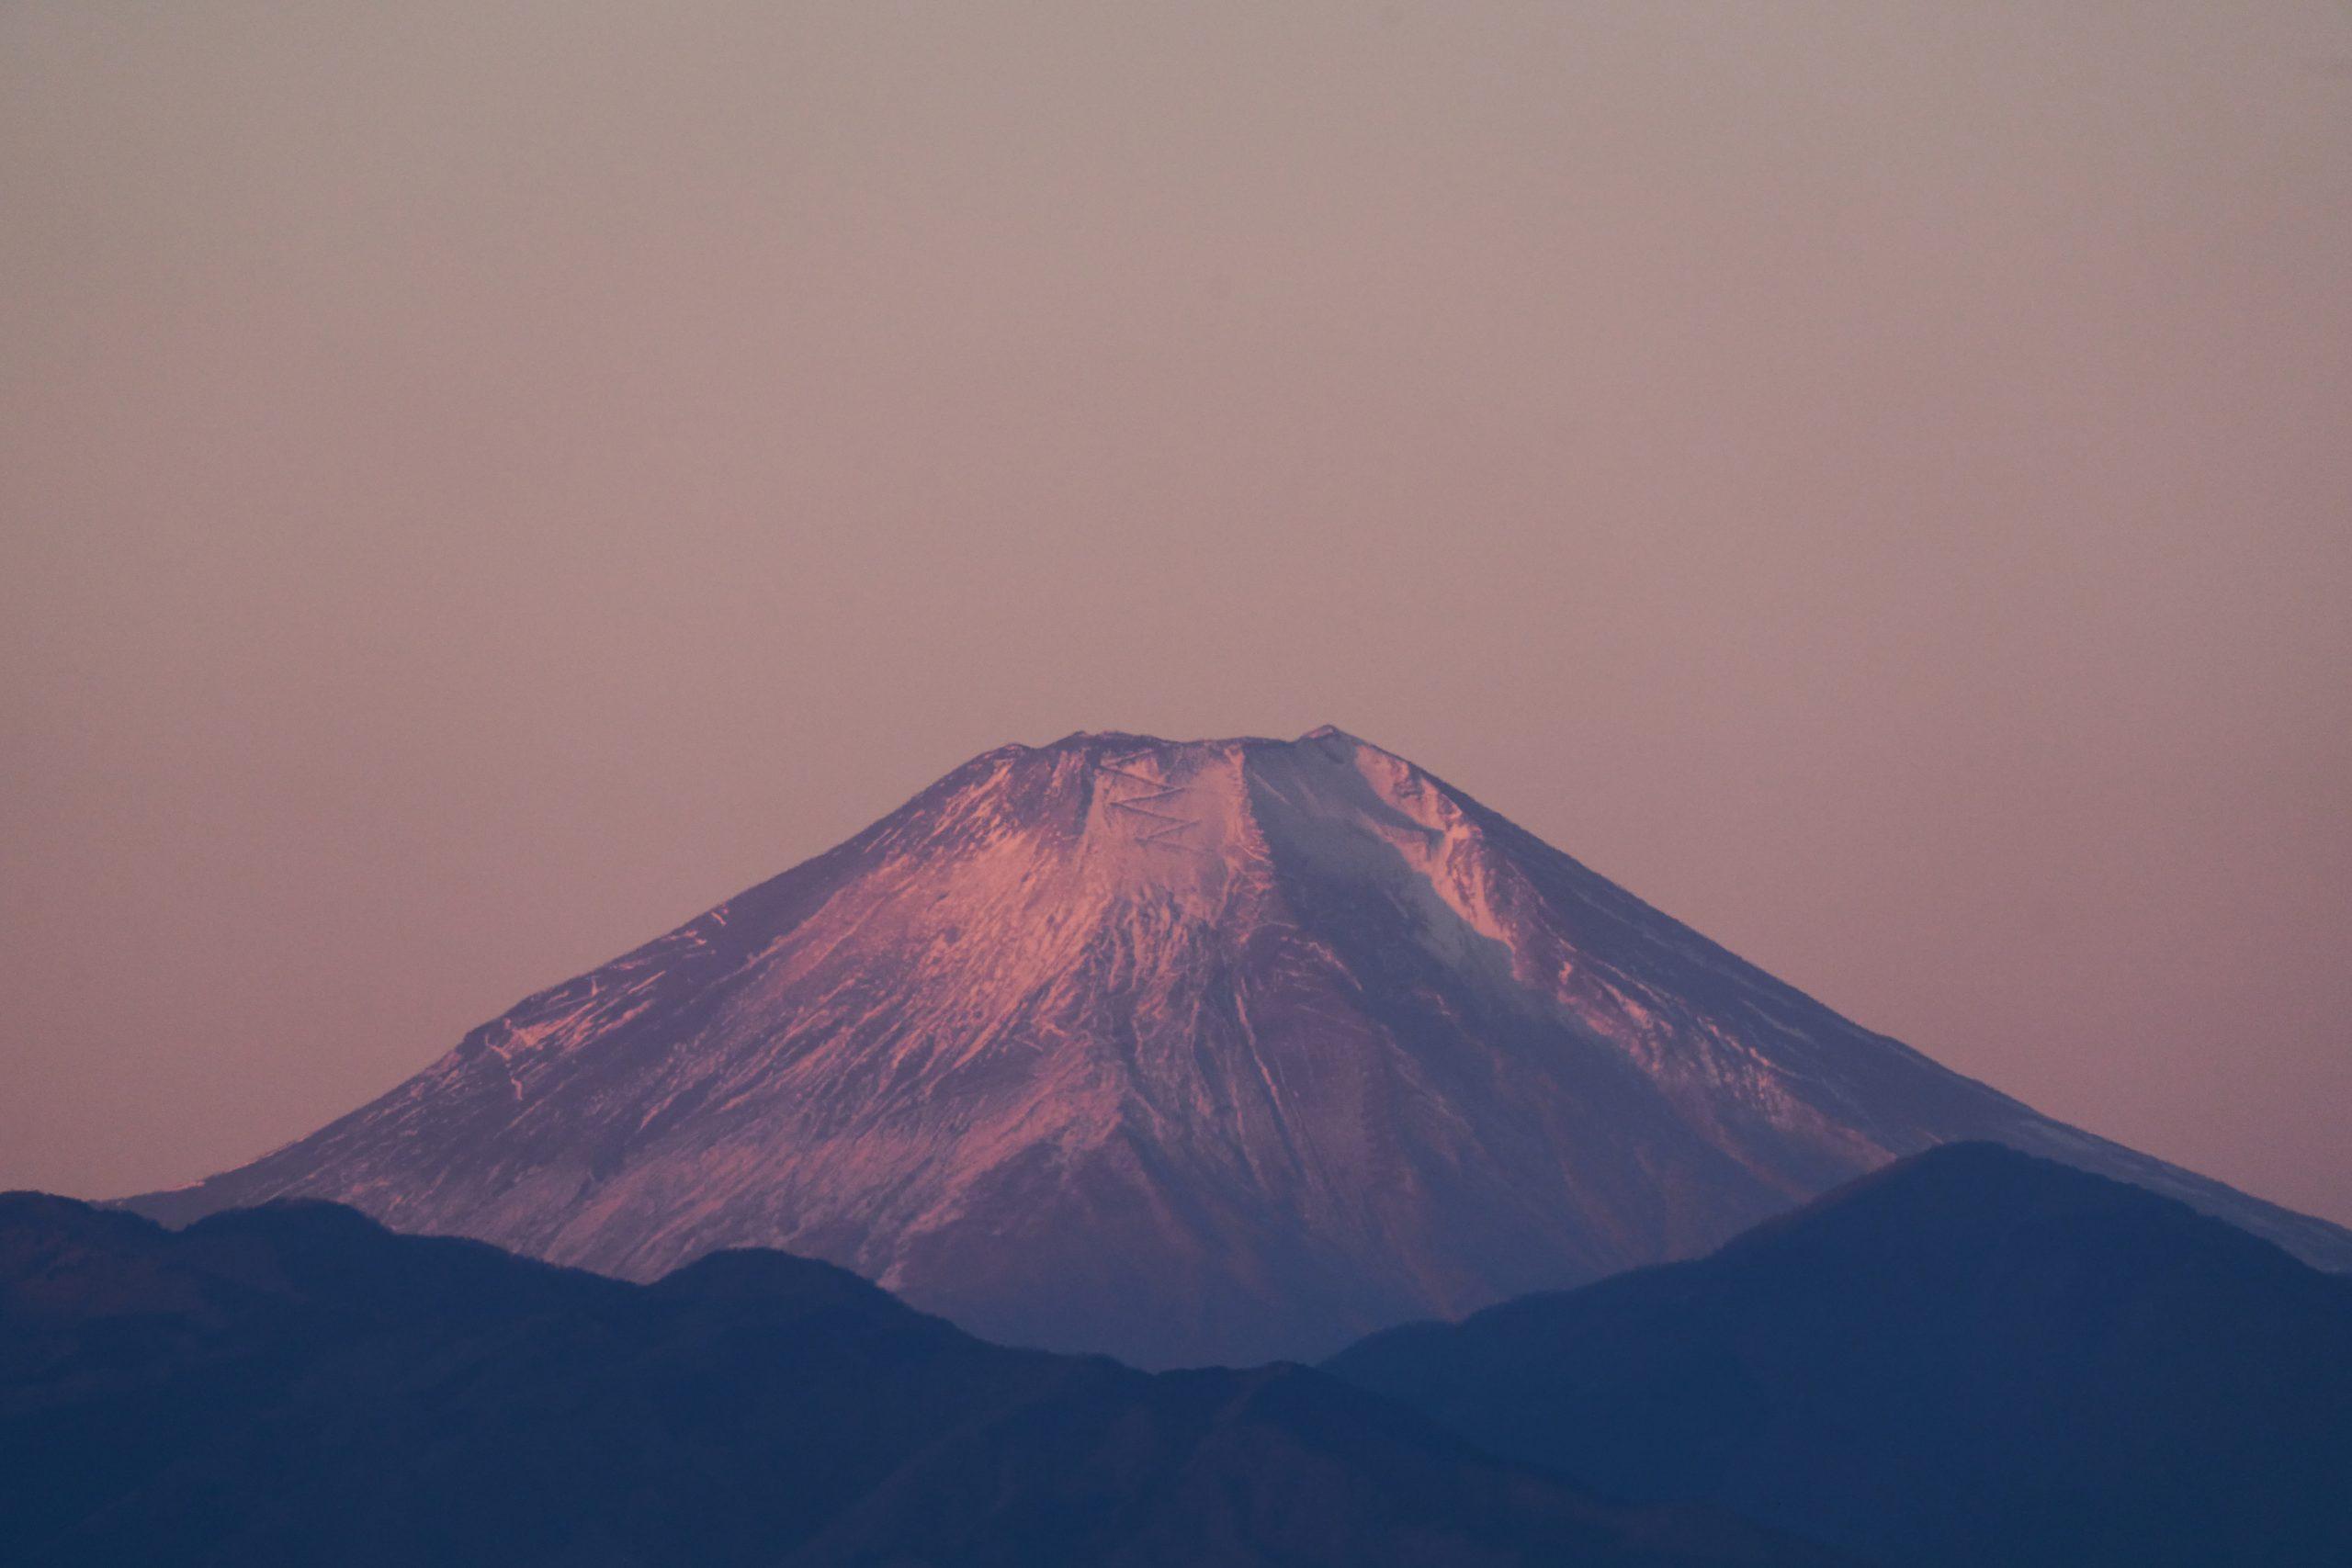 【SONY】まるで望遠鏡!?超望遠ズームで見る冬の富士